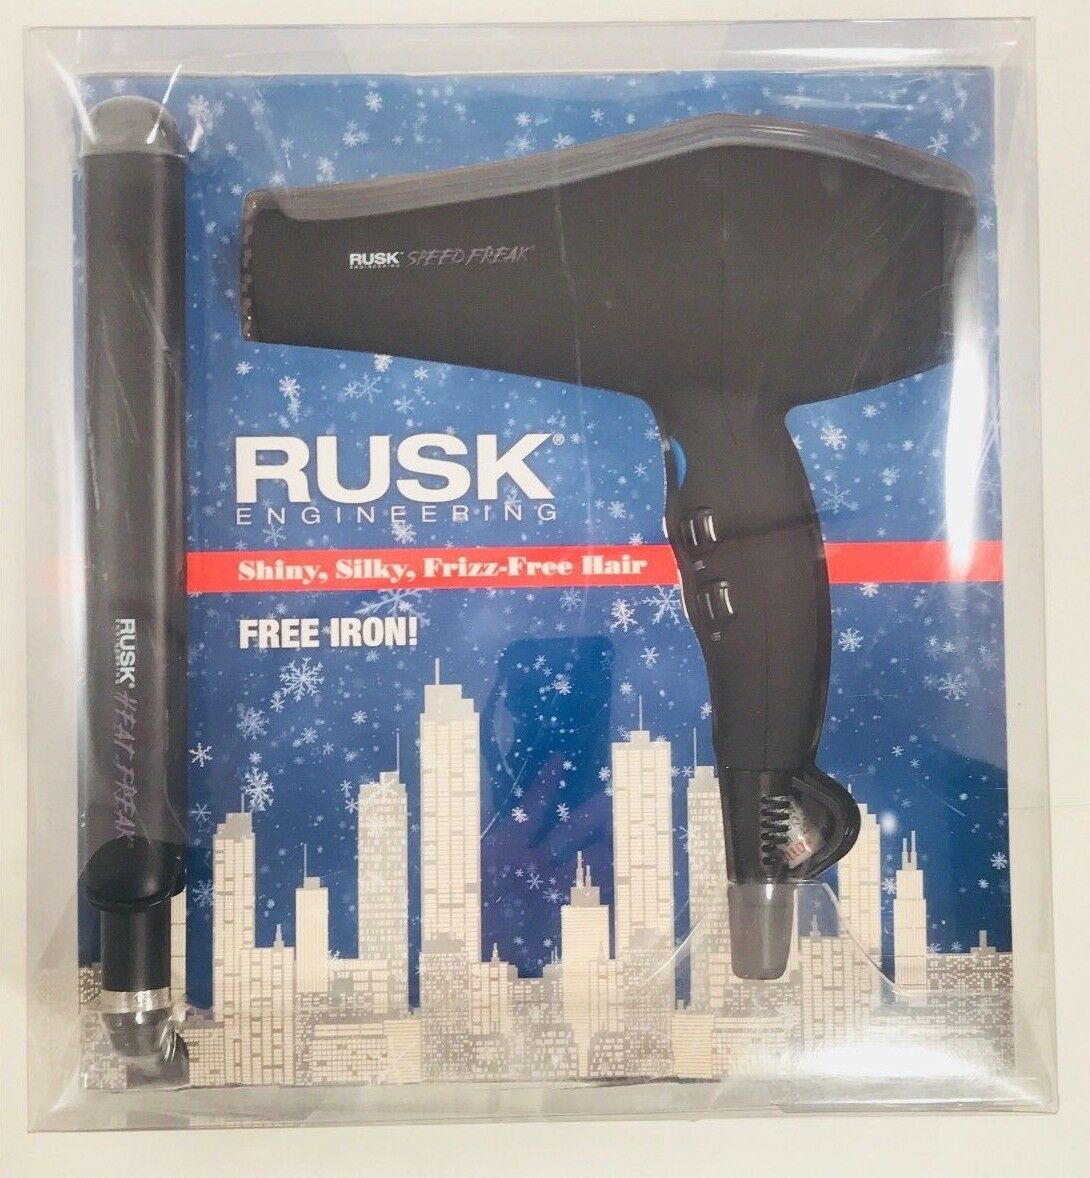 "RUSK HEAT FREAK HAIR BLOW DRYER 1"" STR8 STRAIGHTENER FLAT IR"